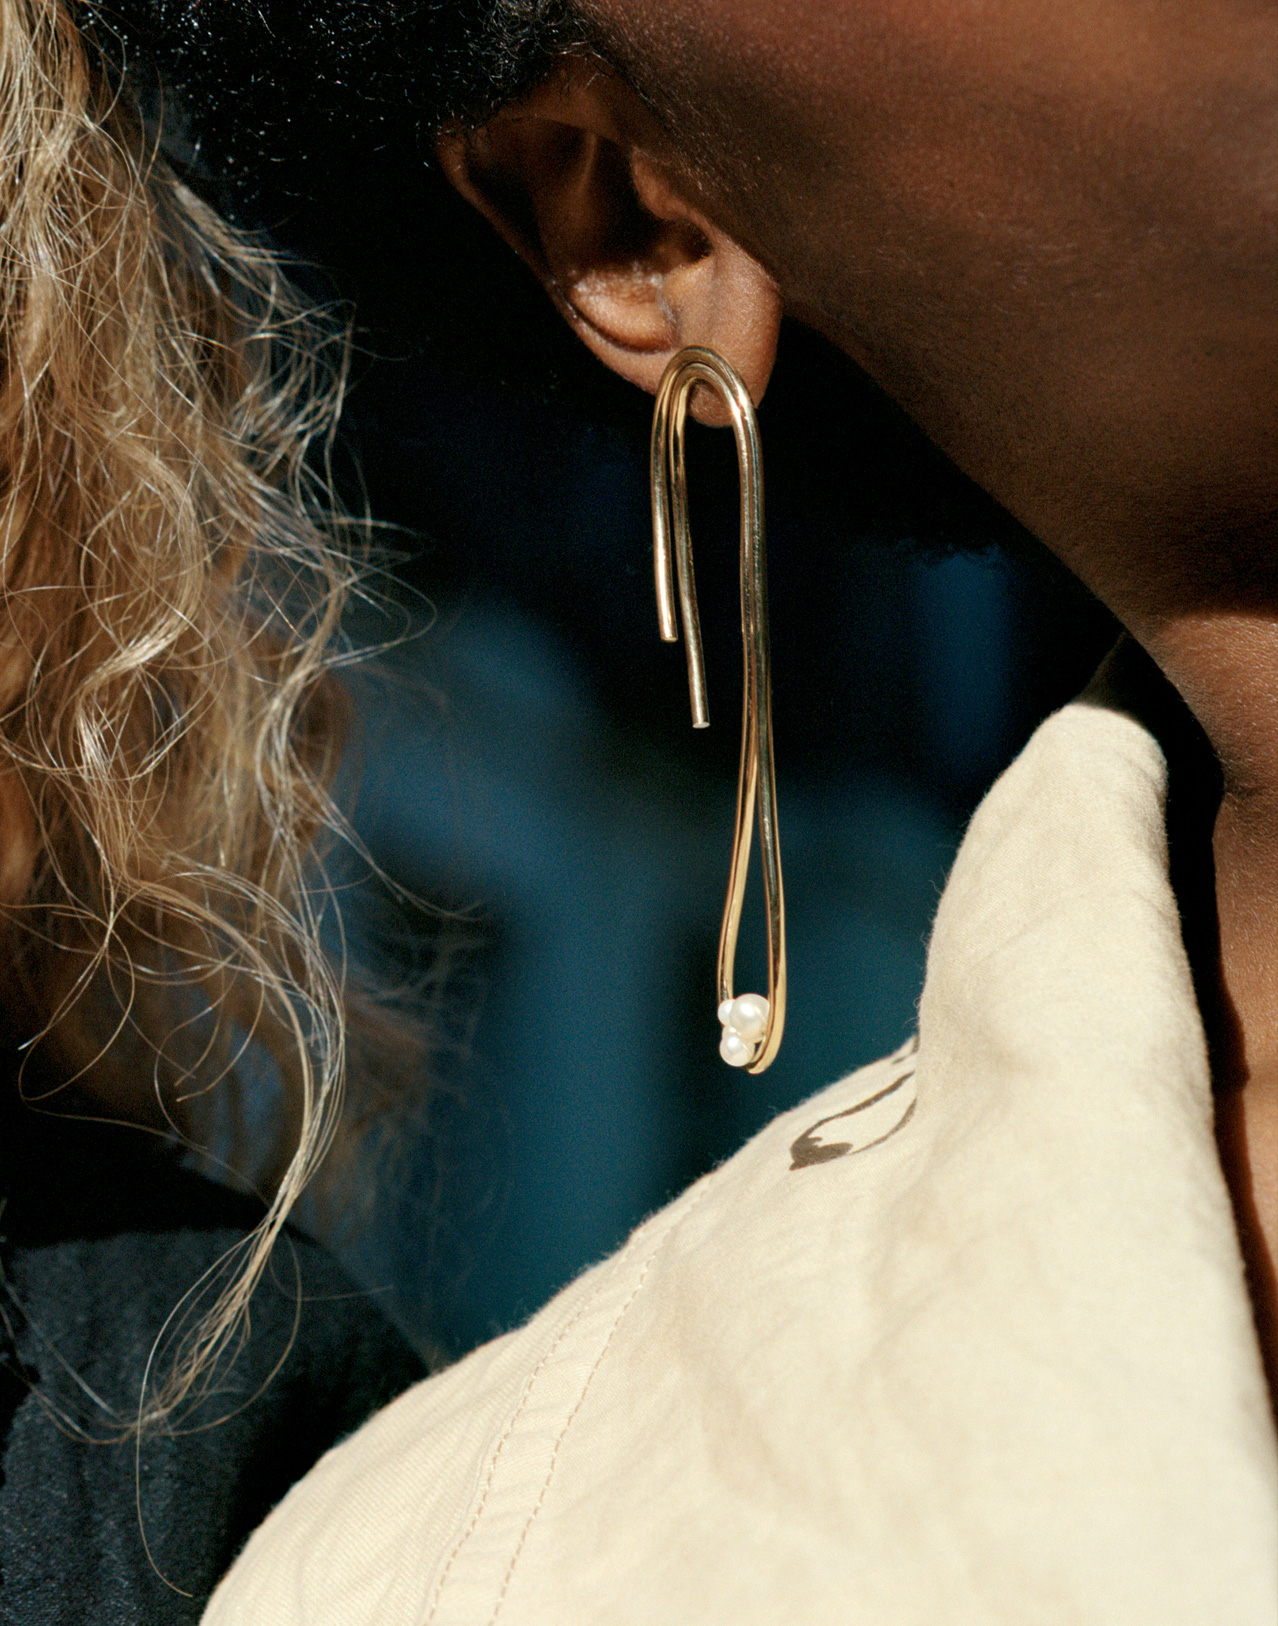 Completedworks-Earring-Gold-Vermeil-The-Advice-of-Edvard-Munch-20-1.jpg